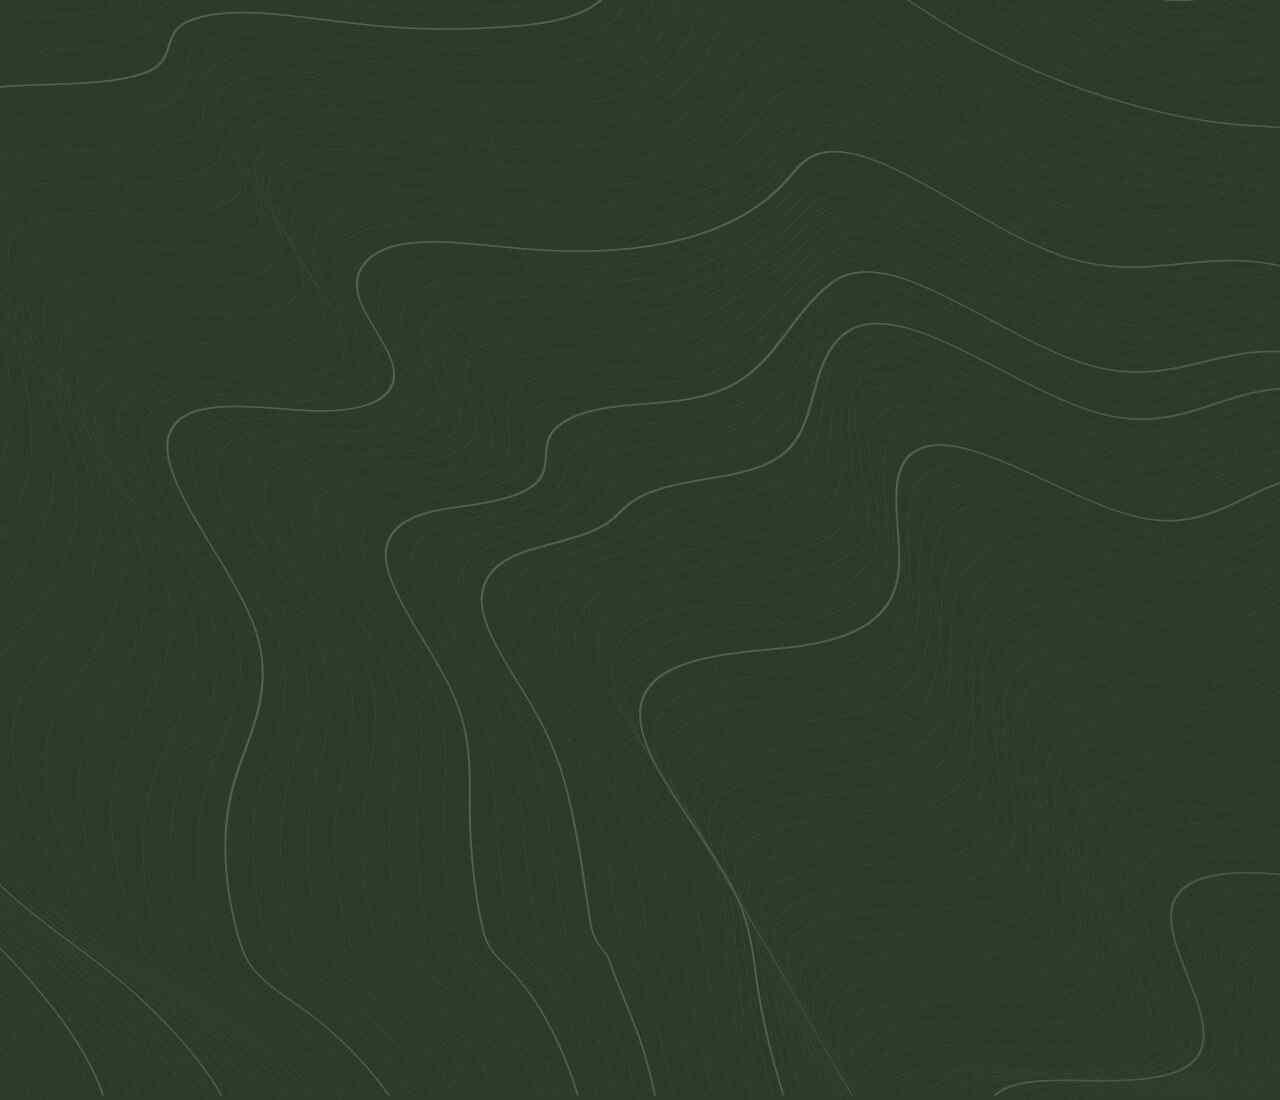 https://huisveluwehuren.nl/wp-content/uploads/2020/02/green-background-1280x1100.jpg